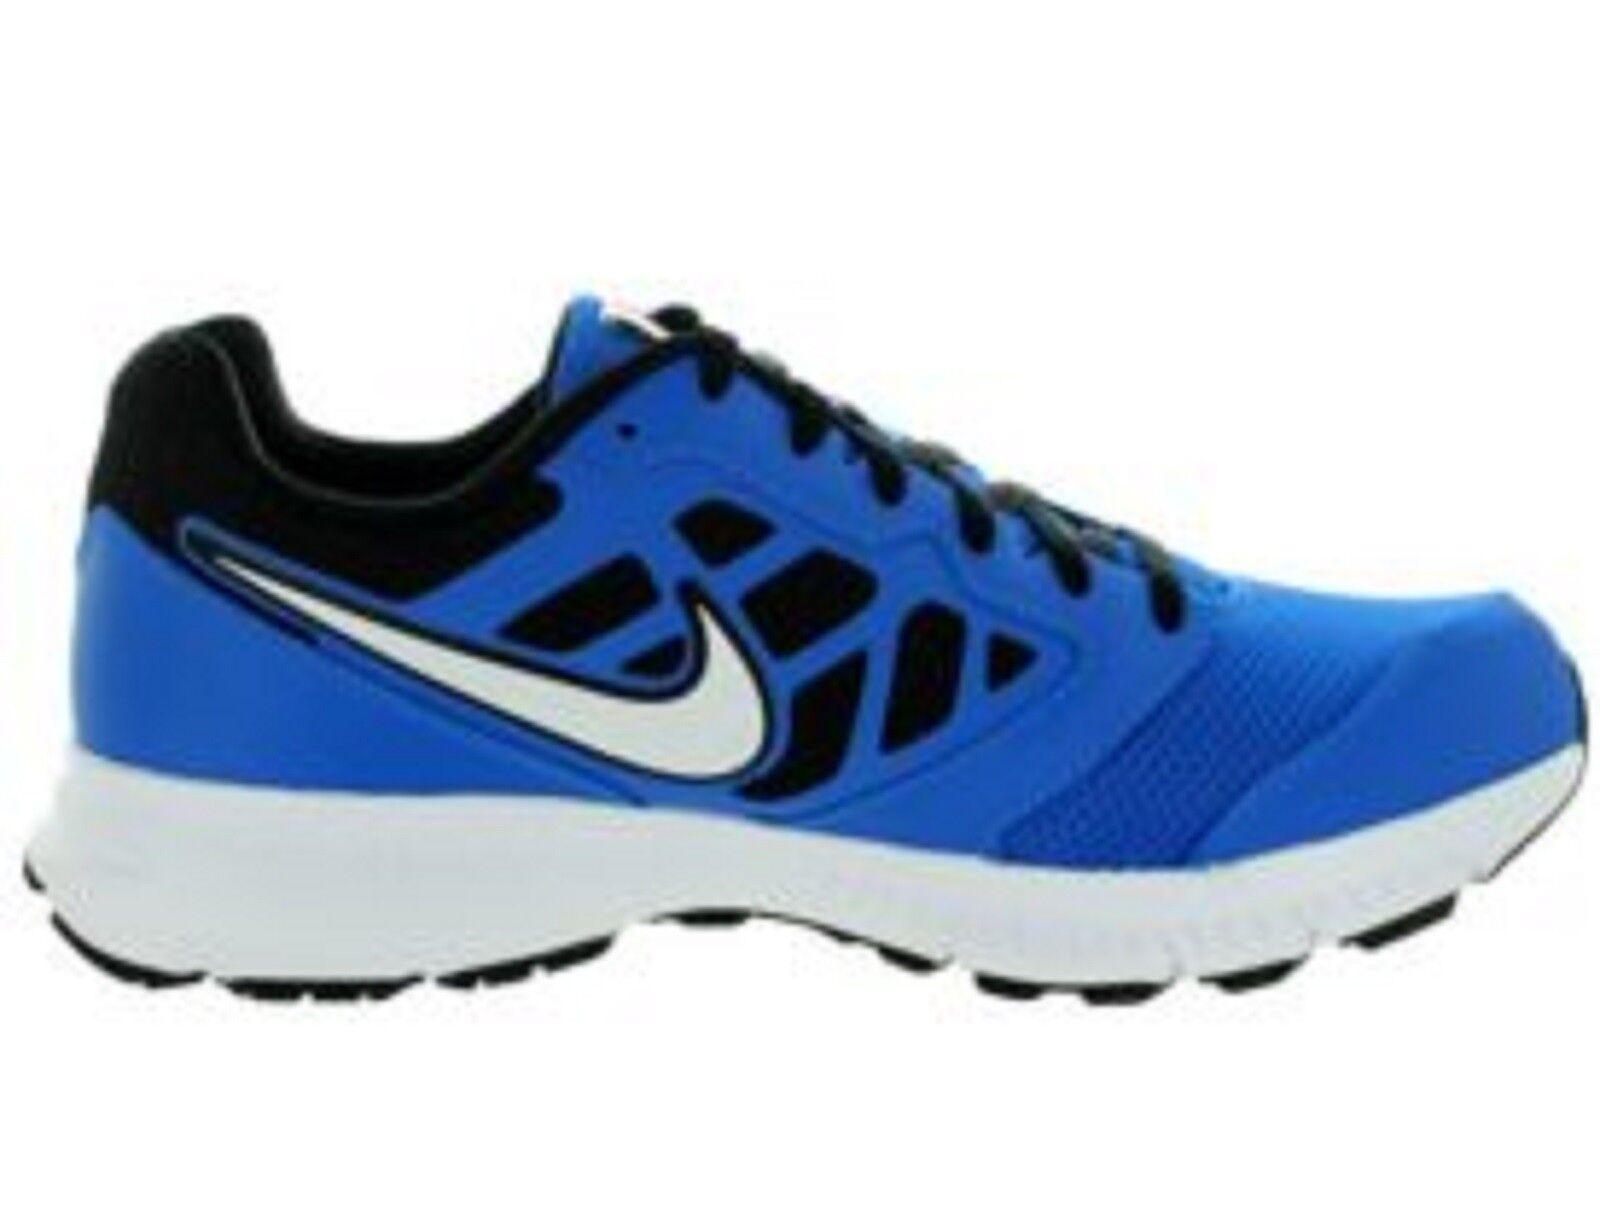 d0ccfc5644f NIKE Men's 'DOWNSHIFTER 6' Running shoes blueE WHITE 11.5 M NIB BLACK Sz.  nyiwed7973-Athletic Shoes